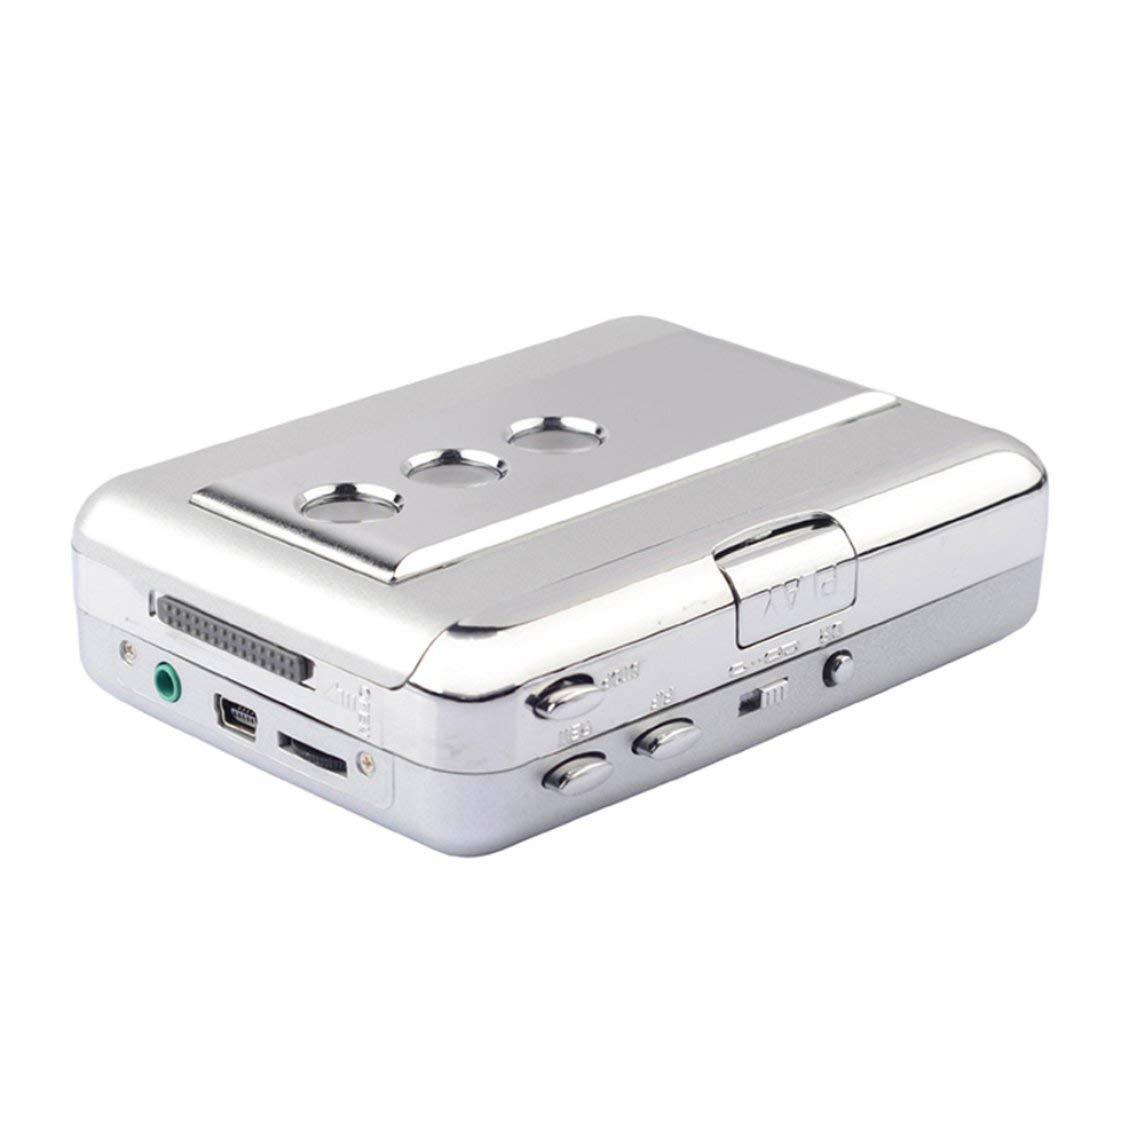 Multifunctional USB Cassette Capture Tape Converter Analog Audio to MP3